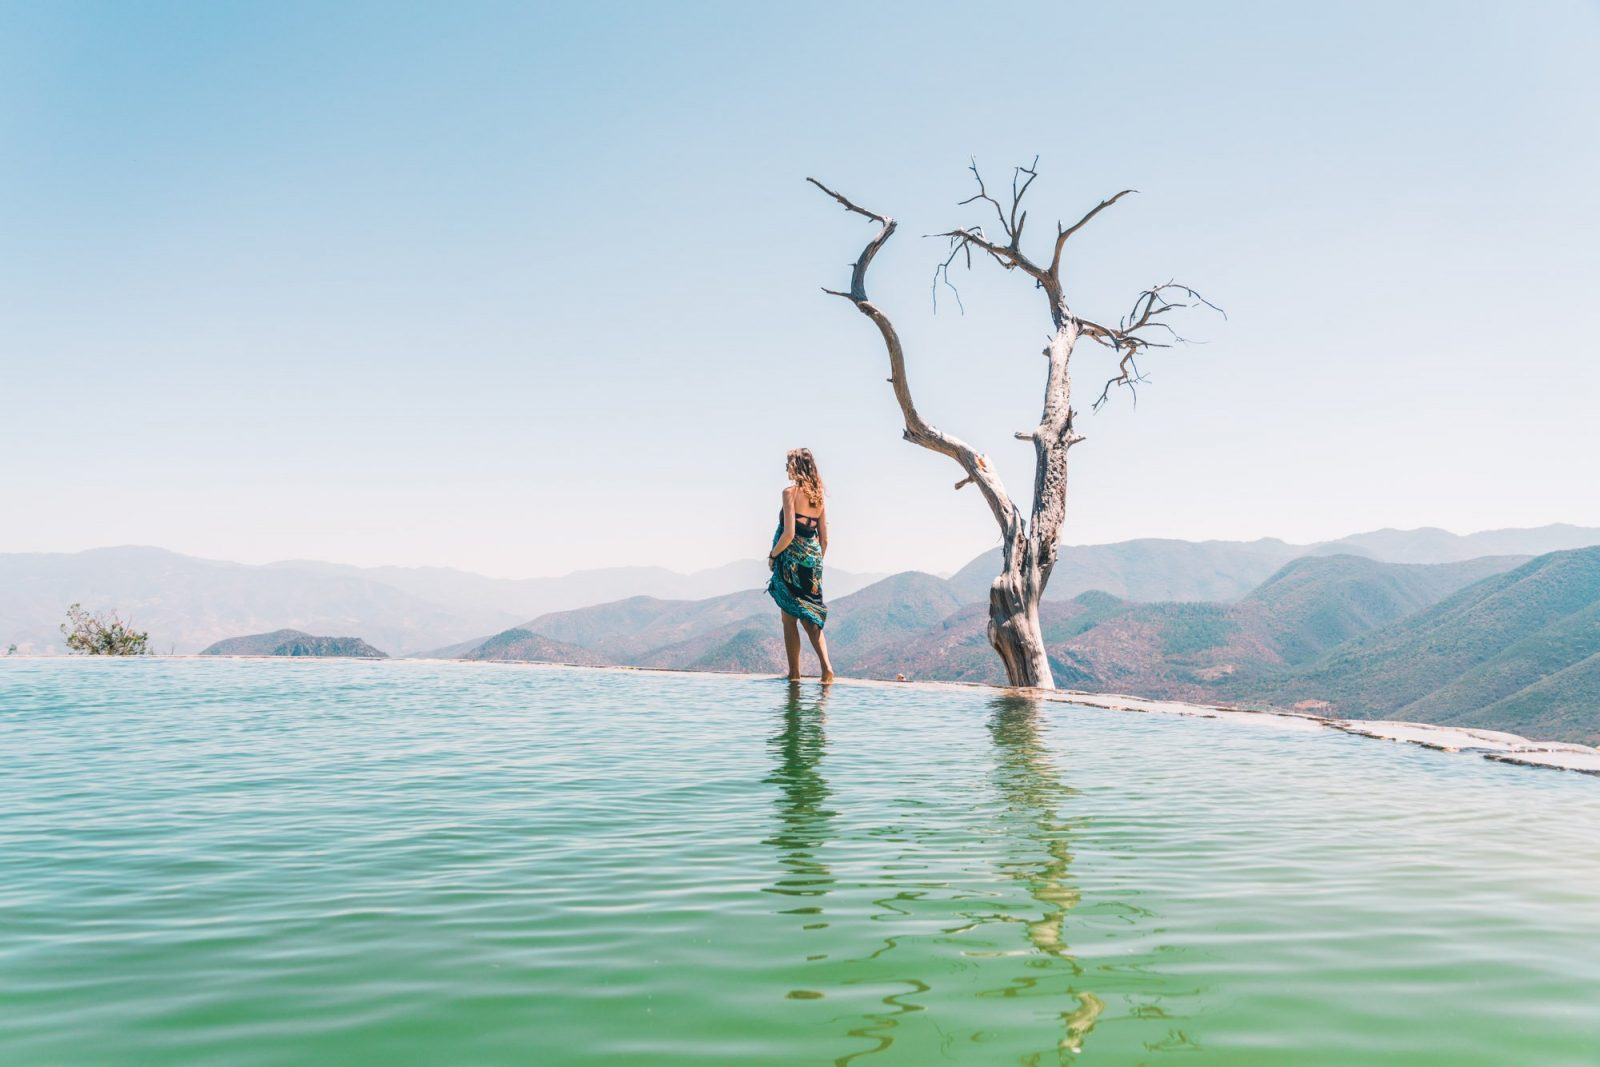 Hierve el Agua near Oaxaca Mexico